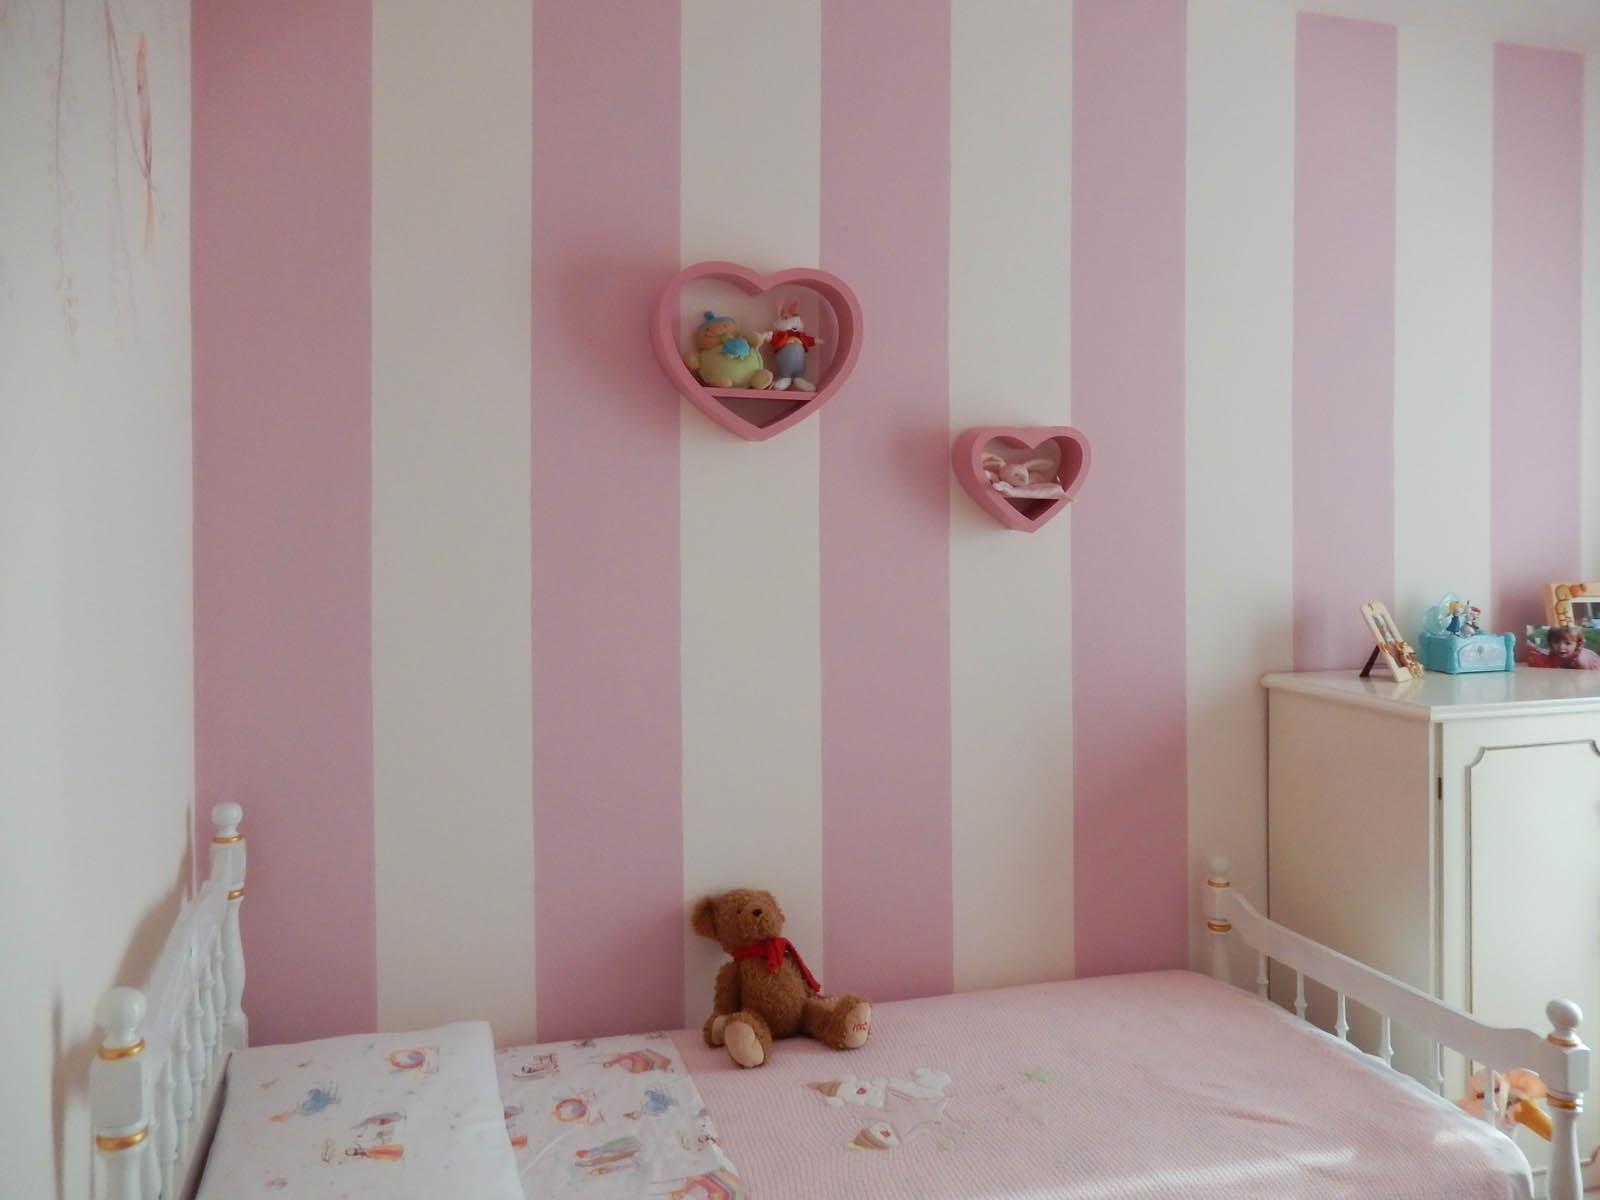 Principesse wonderland studio creativo - Decorazione parete cameretta ...